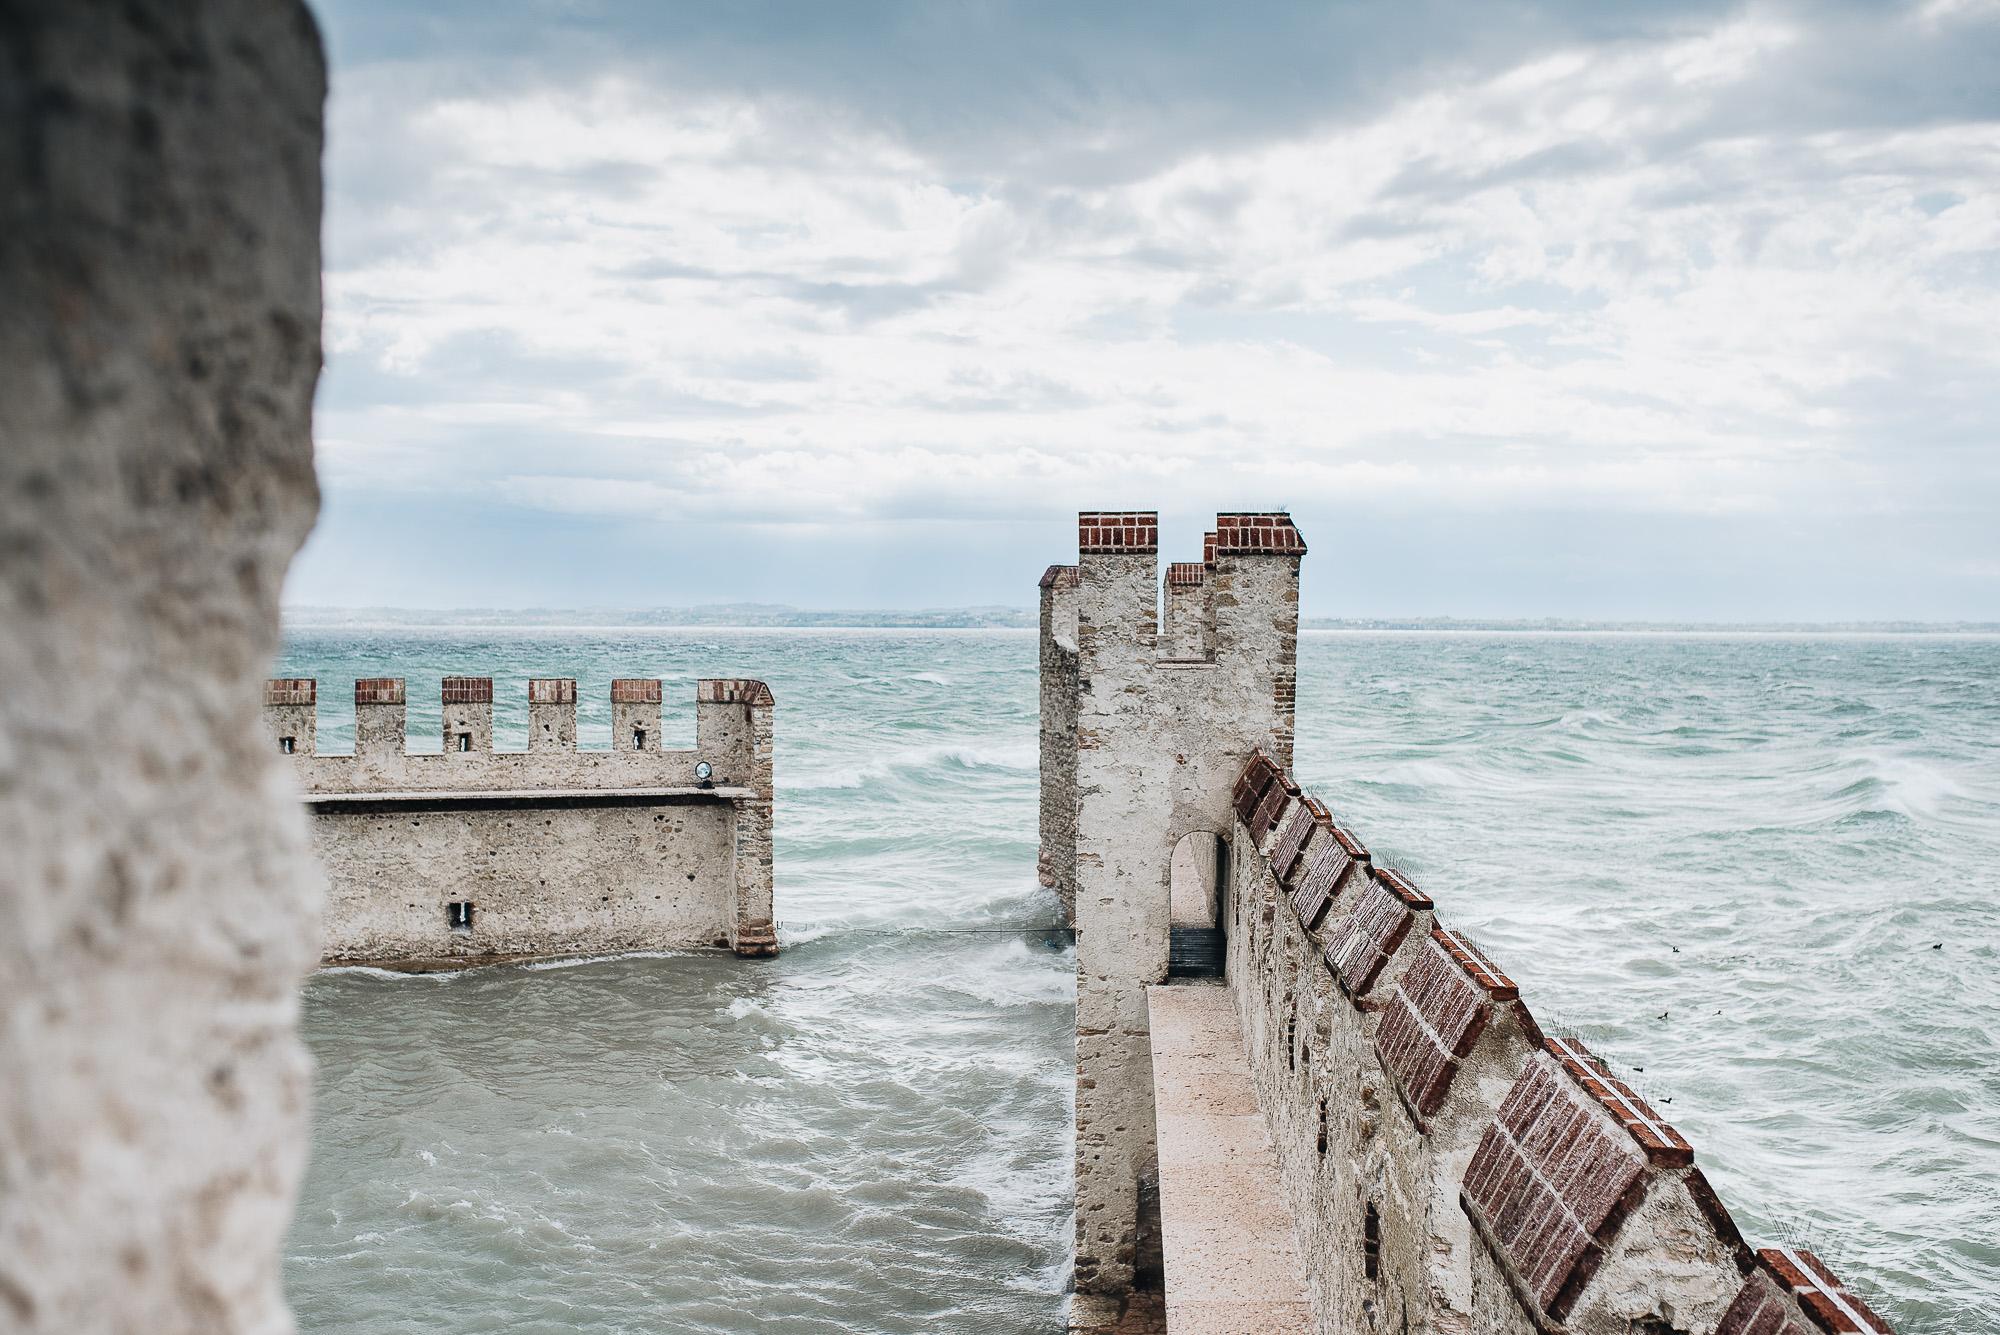 OurBeautifulAdventure-LakeGarda-Italy-Blog-1357.jpg